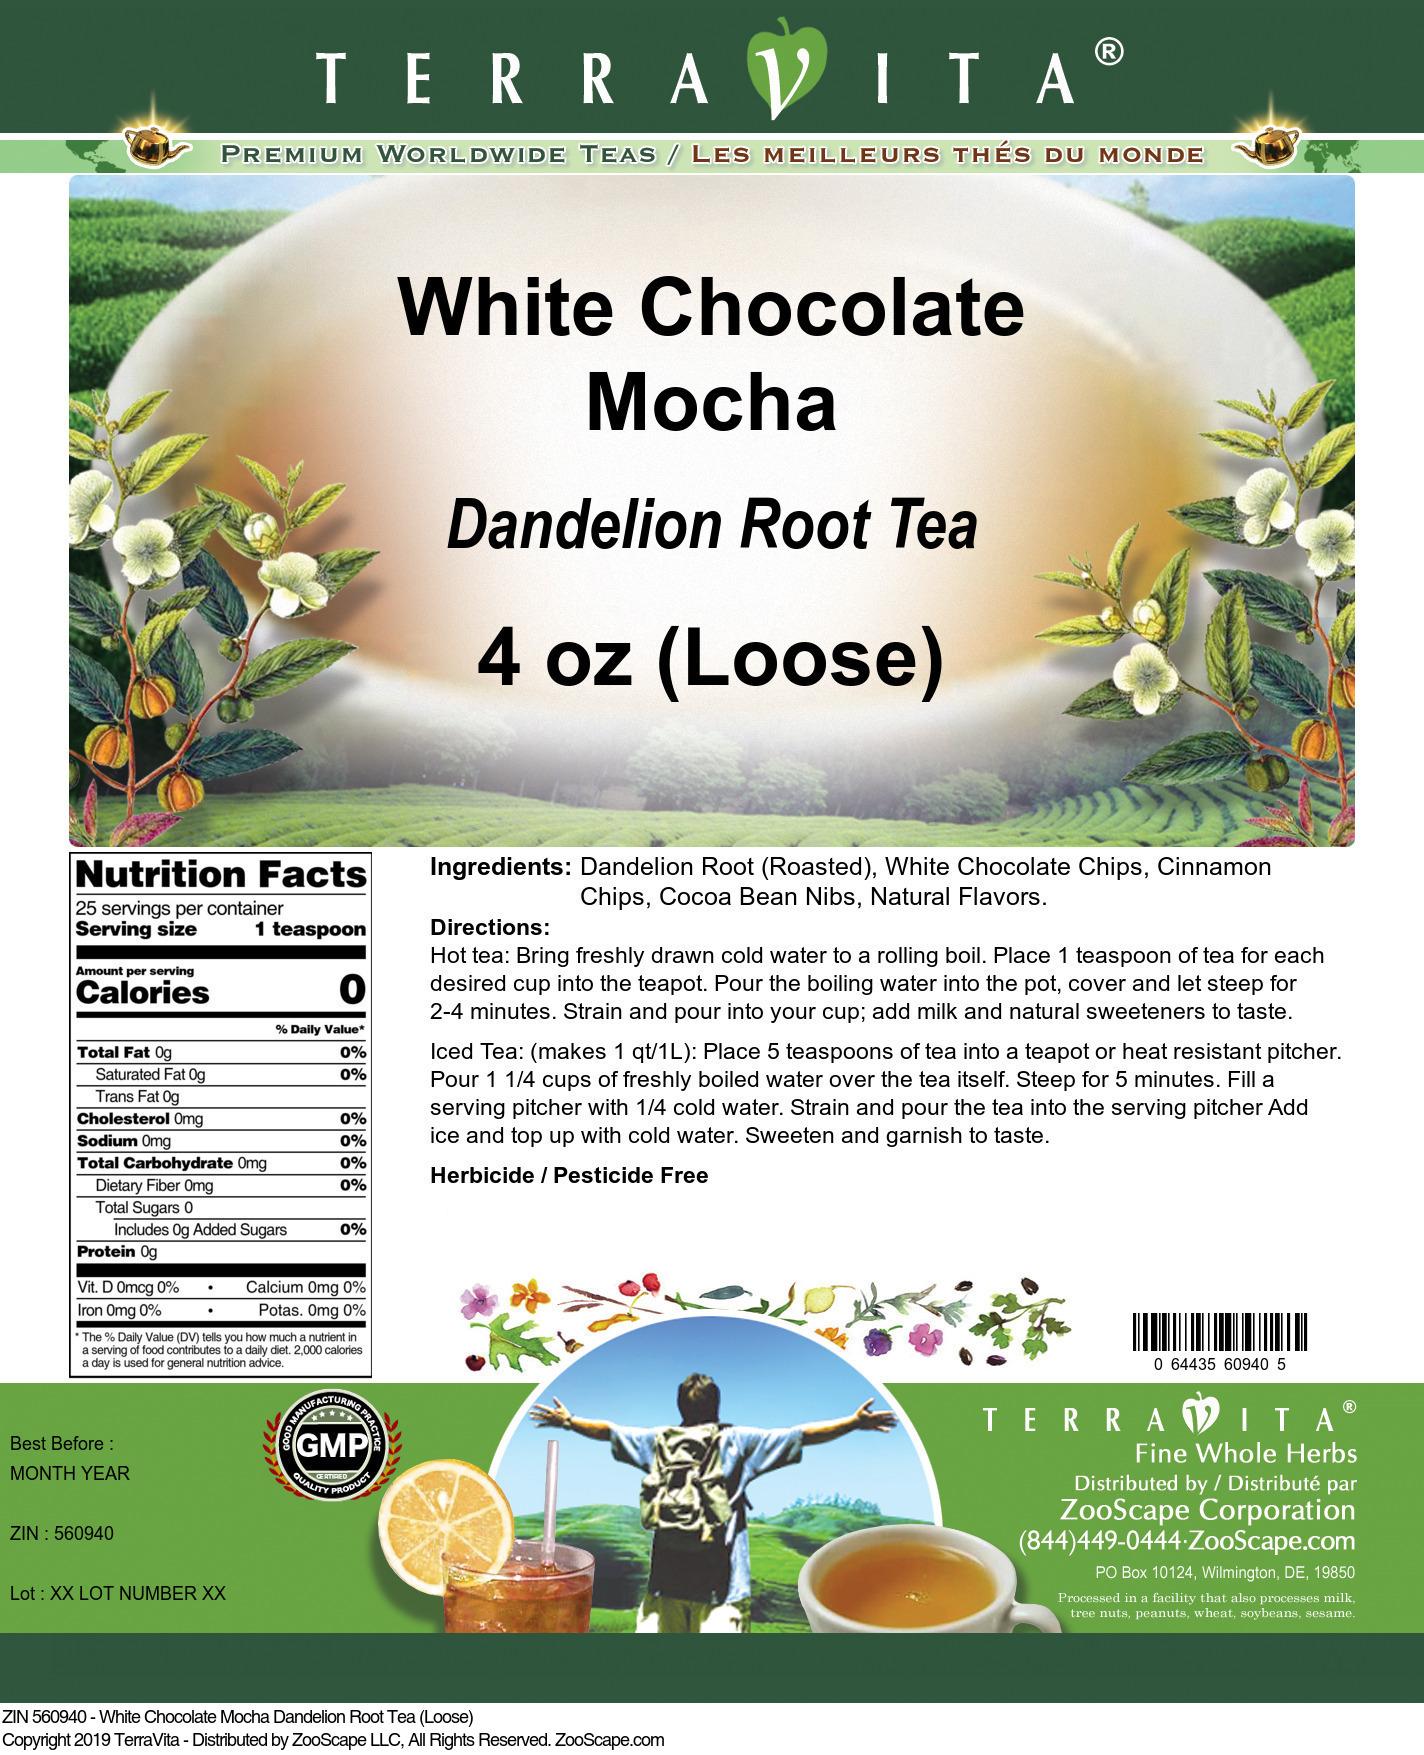 White Chocolate Mocha Dandelion Root Tea (Loose)